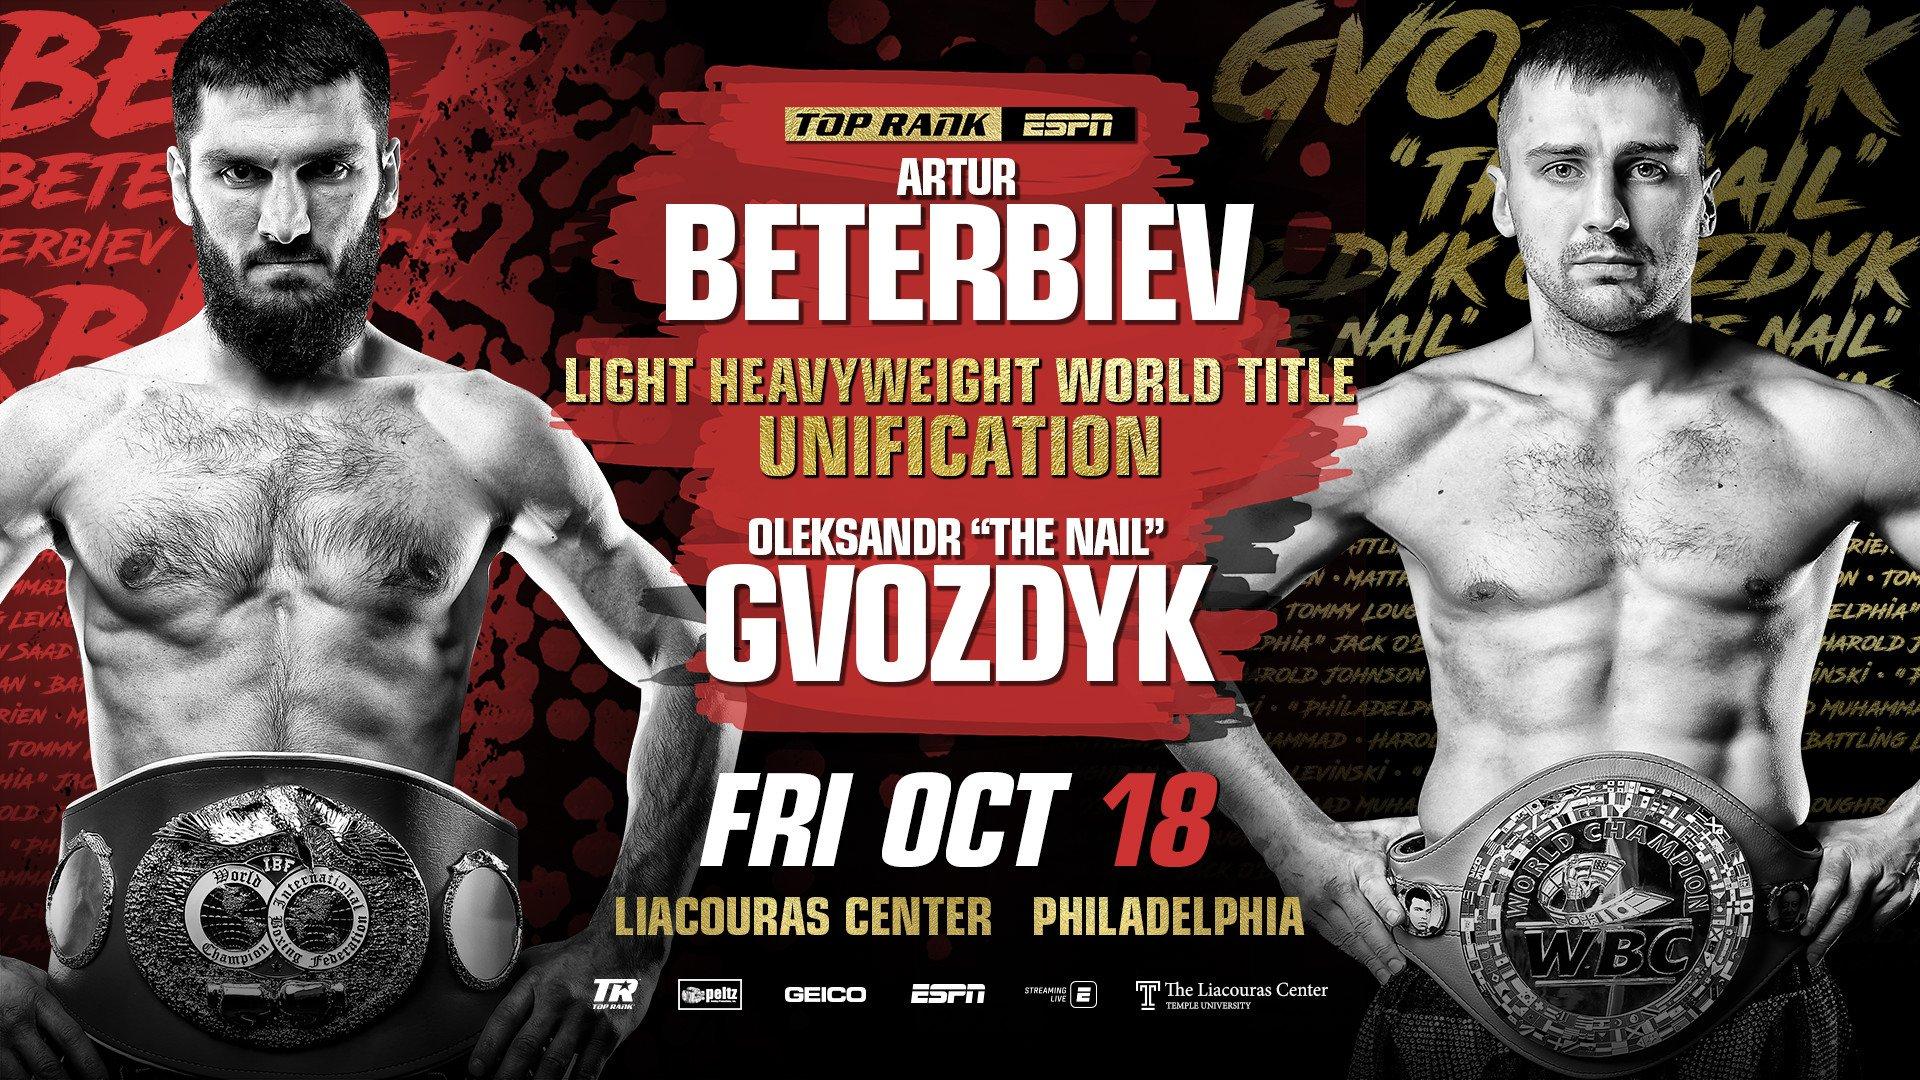 Artur Beterbiev, Oleksandr Gvozdyk - Two very bad men are set for an old-fashioned Philadelphia throwdown.